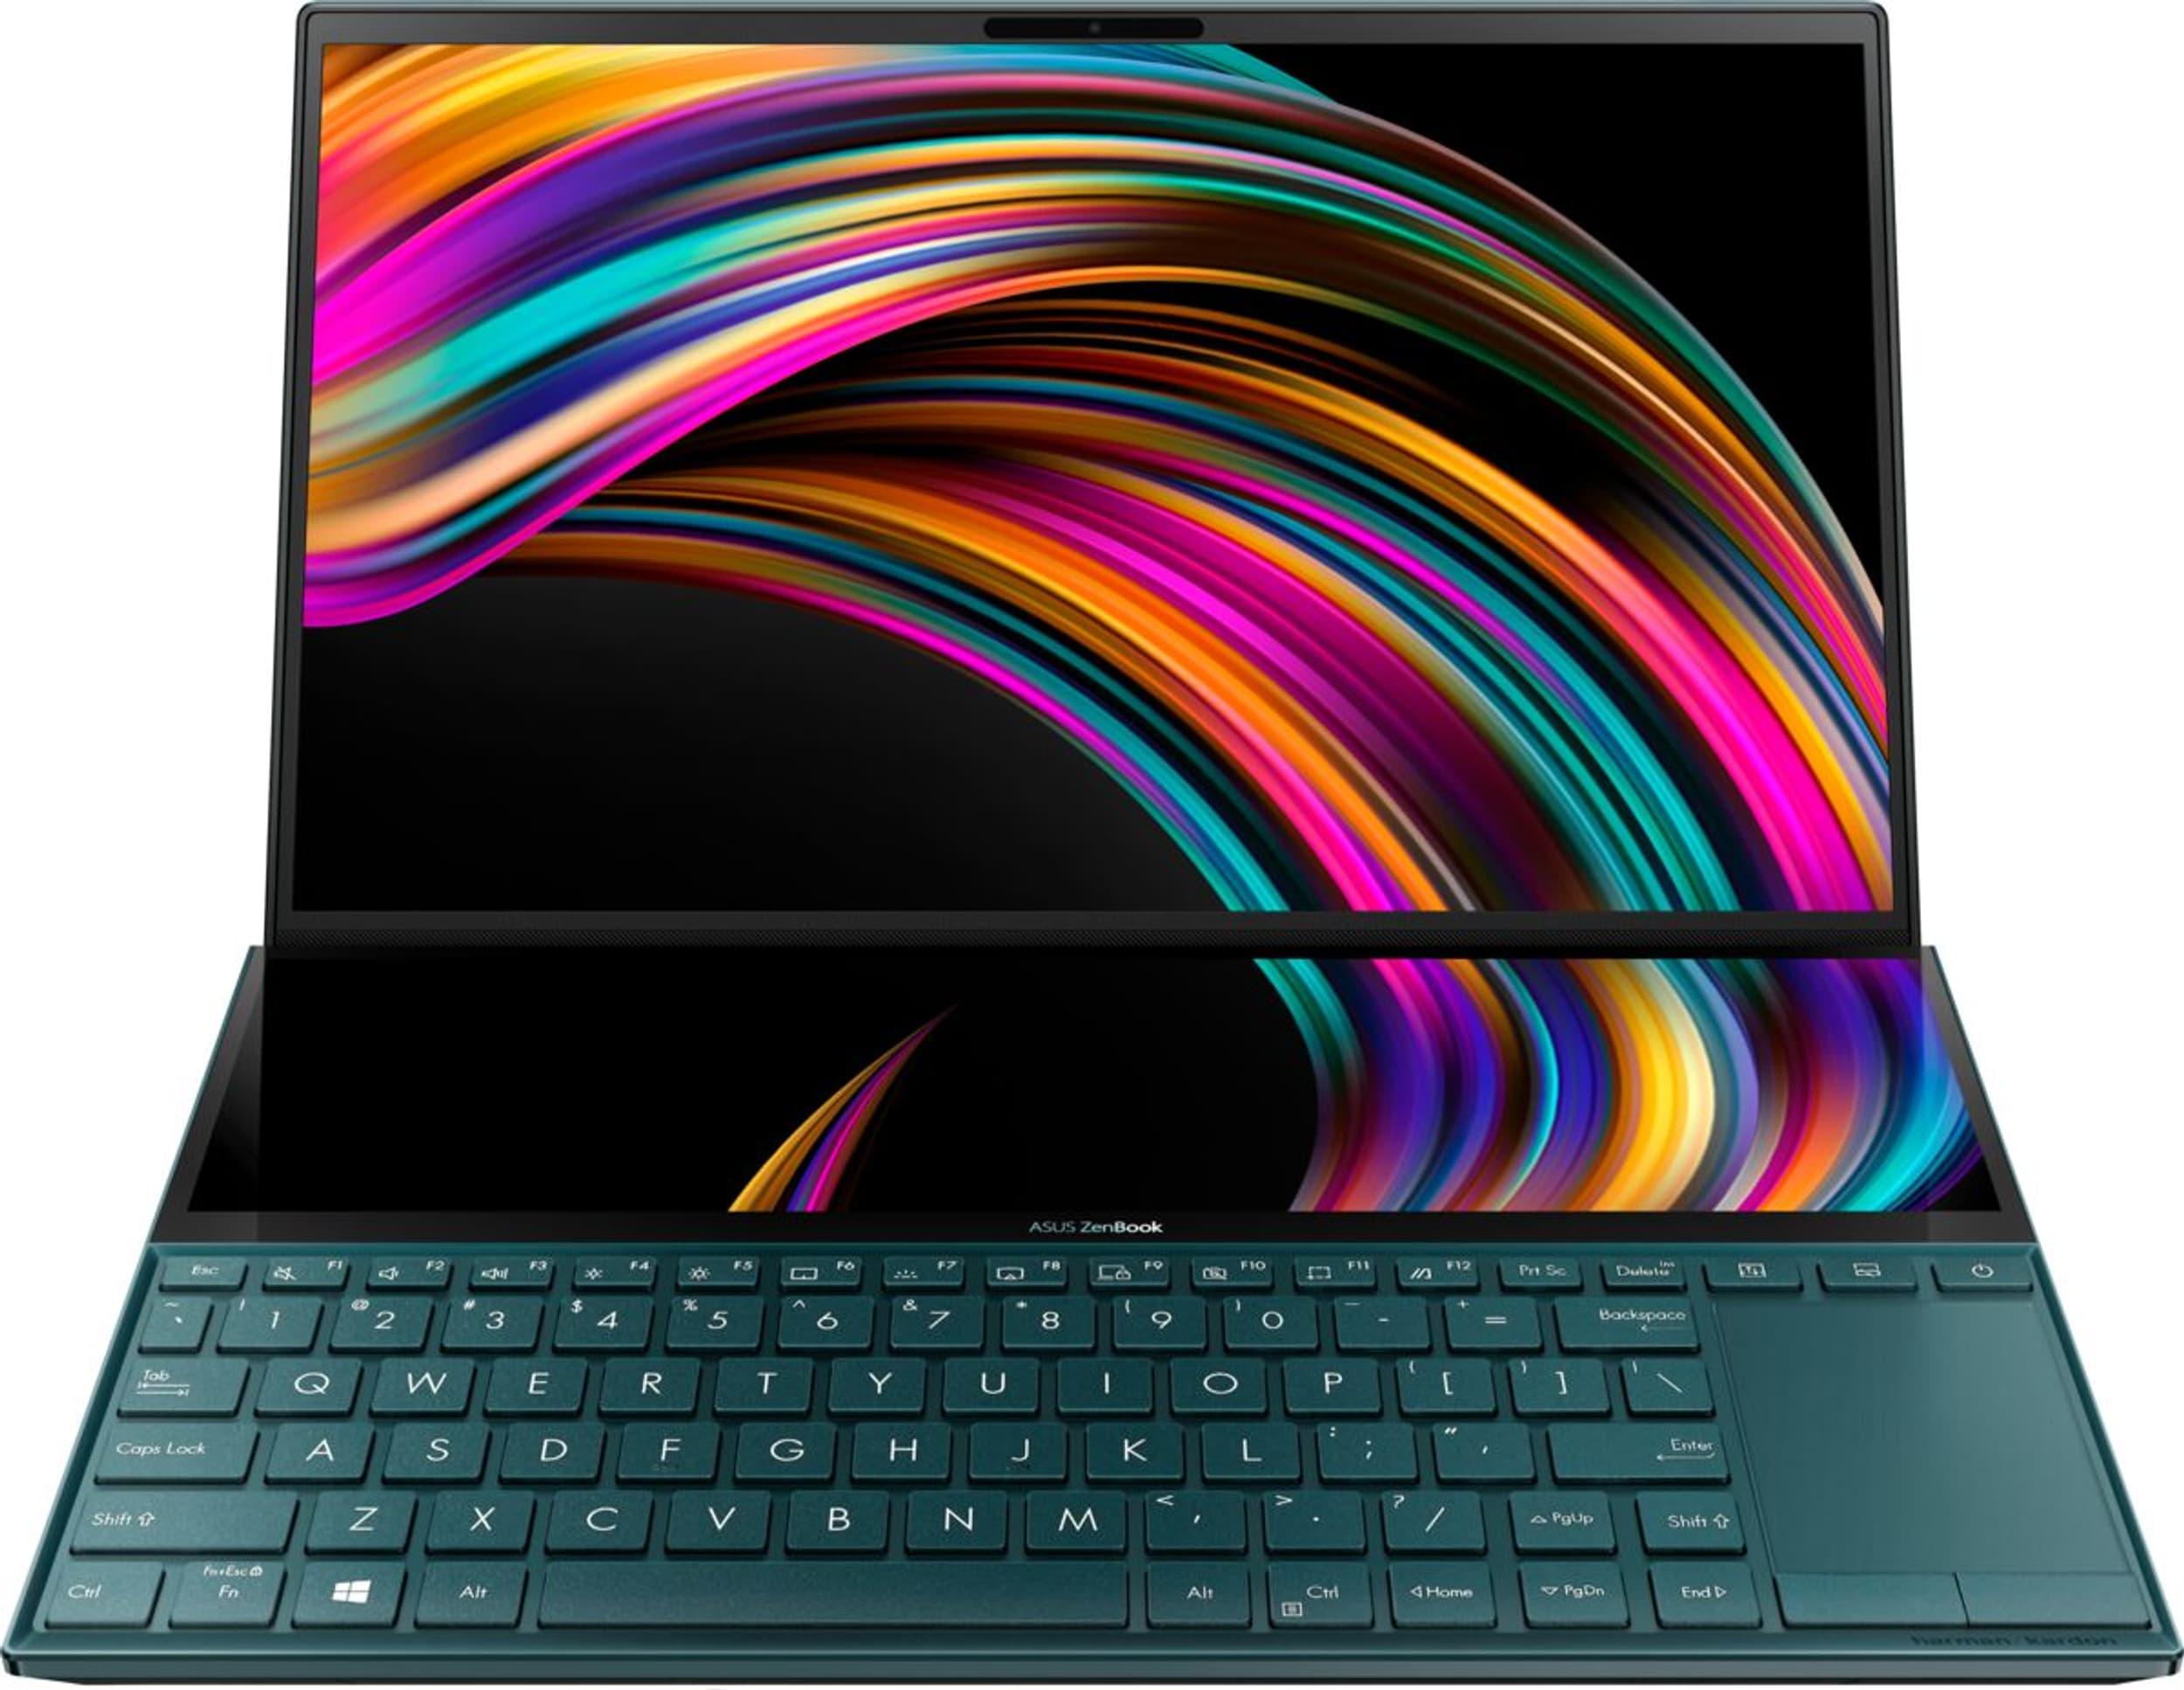 Asus ZenBook Duo UX481FL-HJ103T